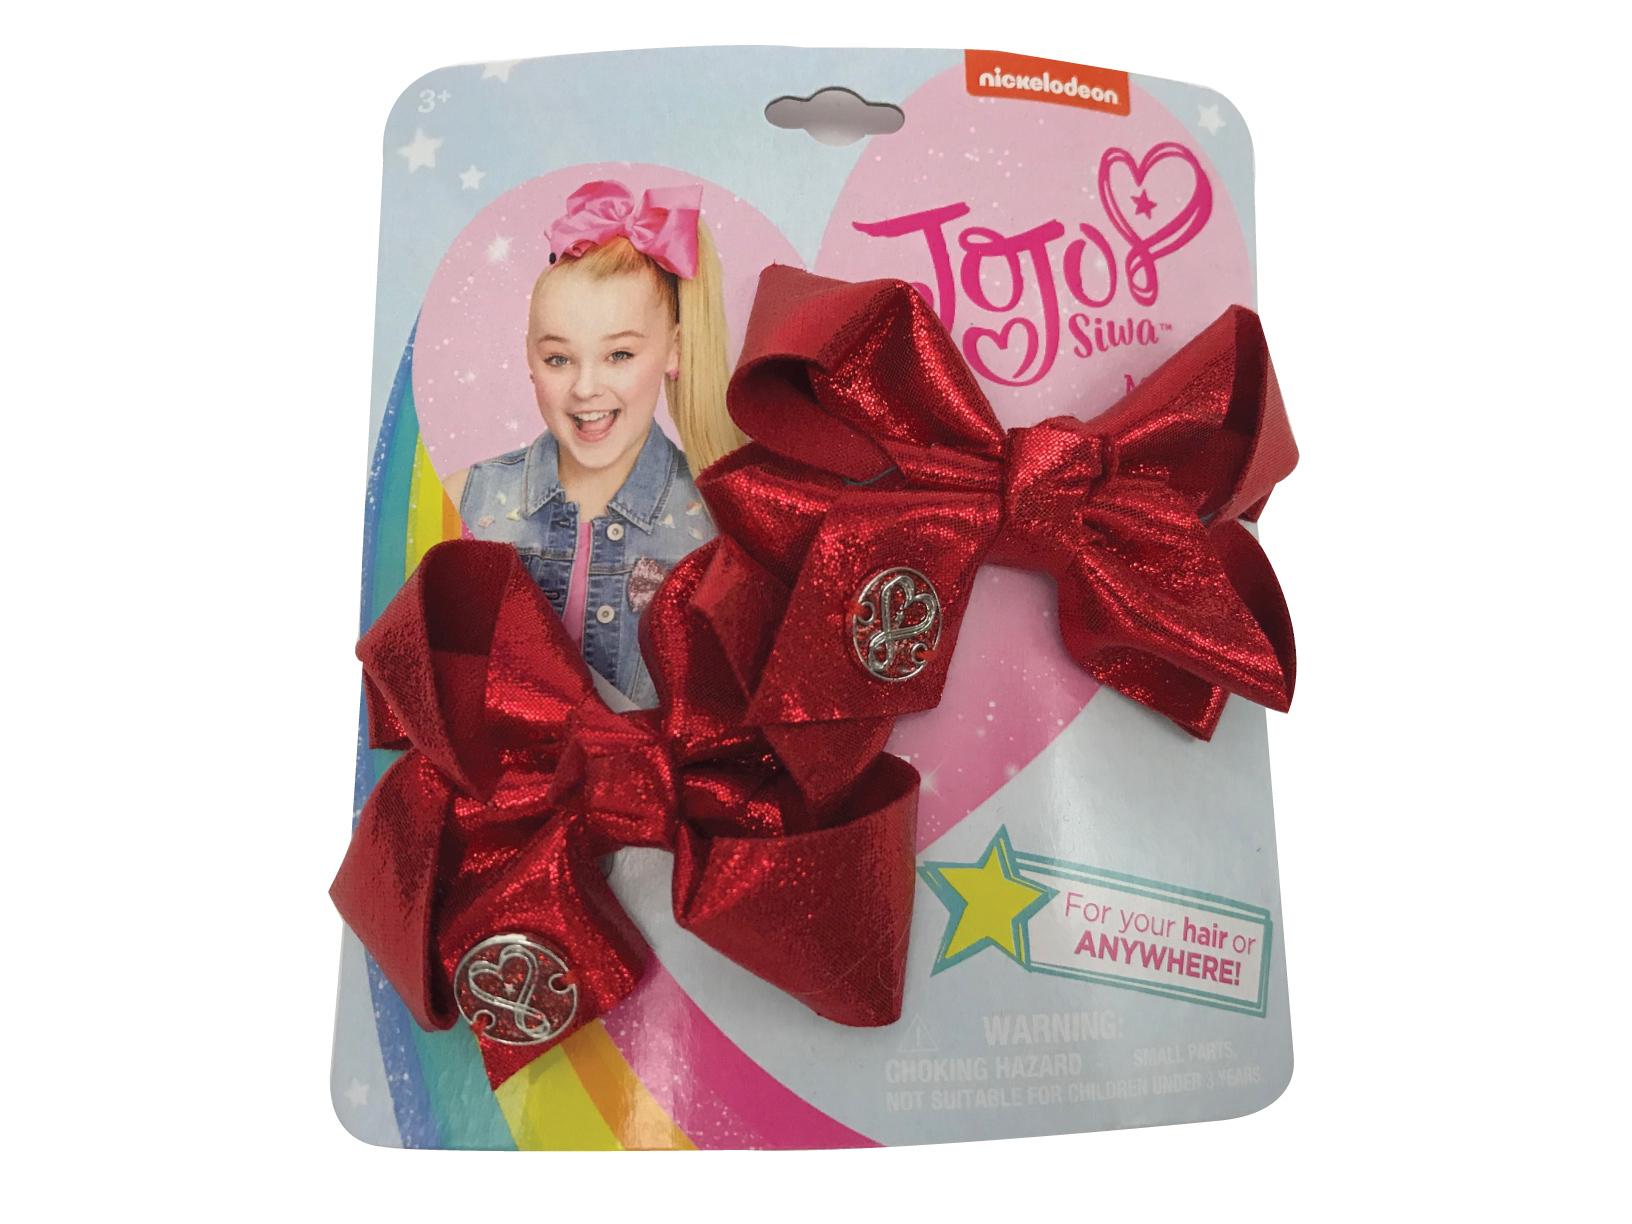 JoJo Siwa Small Hair Bow Set (Red Metallic)